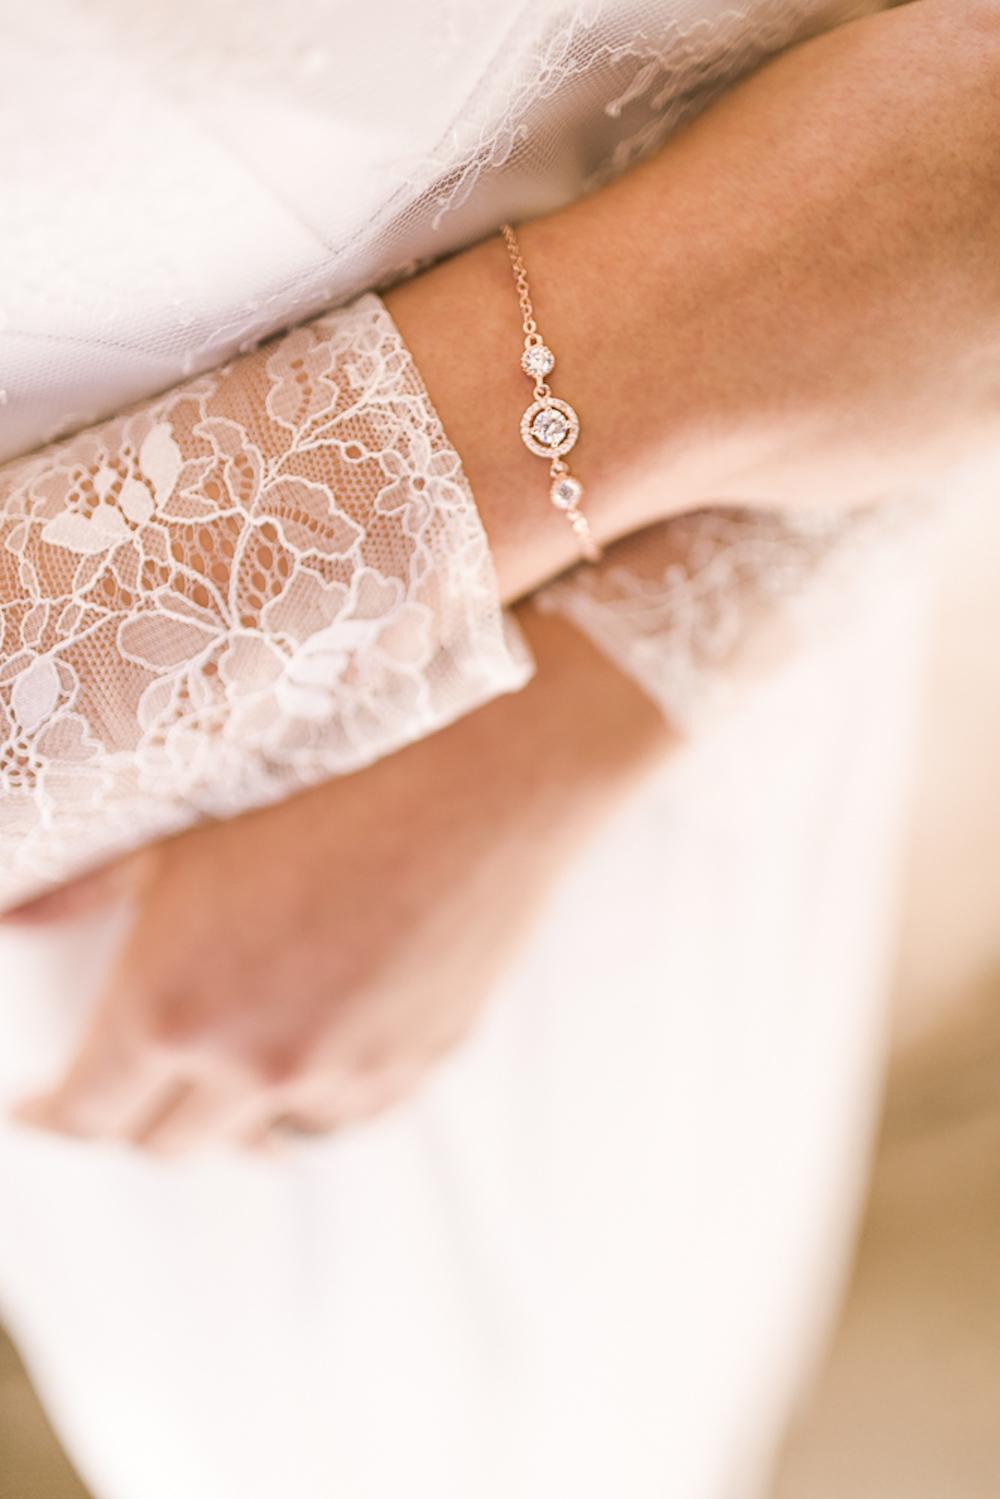 parisian-inspired-blog-mariage-shooting-inspiration-vegetal-abbaye-trois-fontaines-marne-cg-photographie-34.jpg